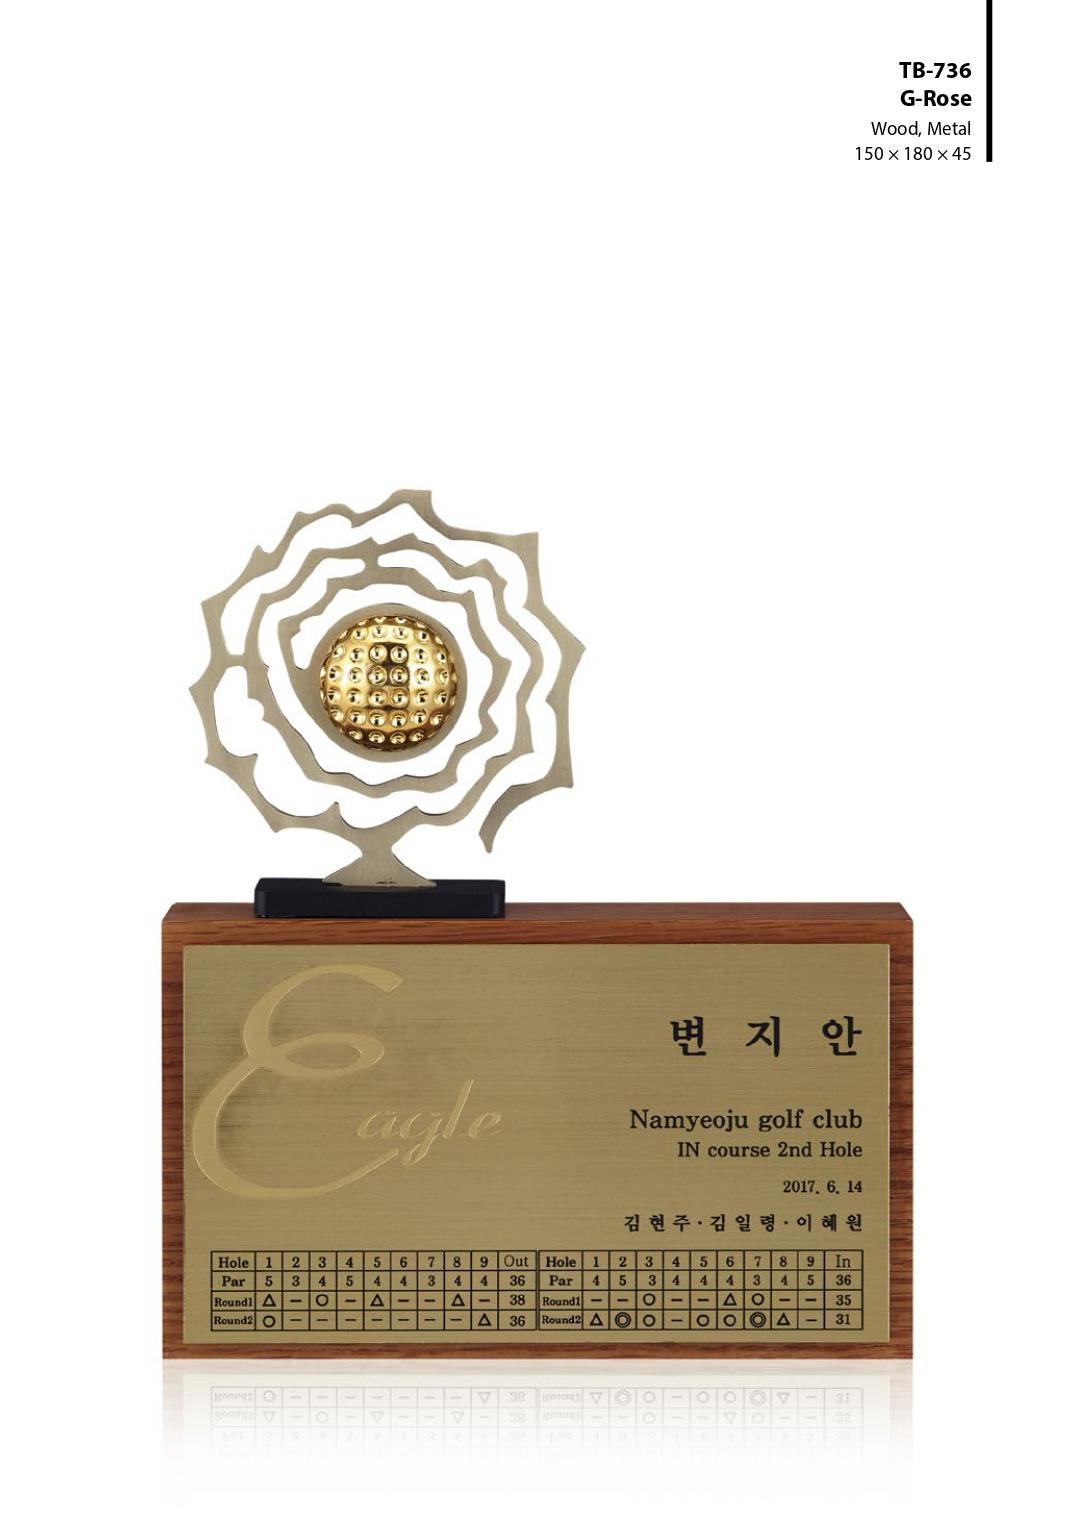 KLPK45036 G-Rose 이글패 골프트로피 상패 트로피 판촉물 제작 케이엘피코리아